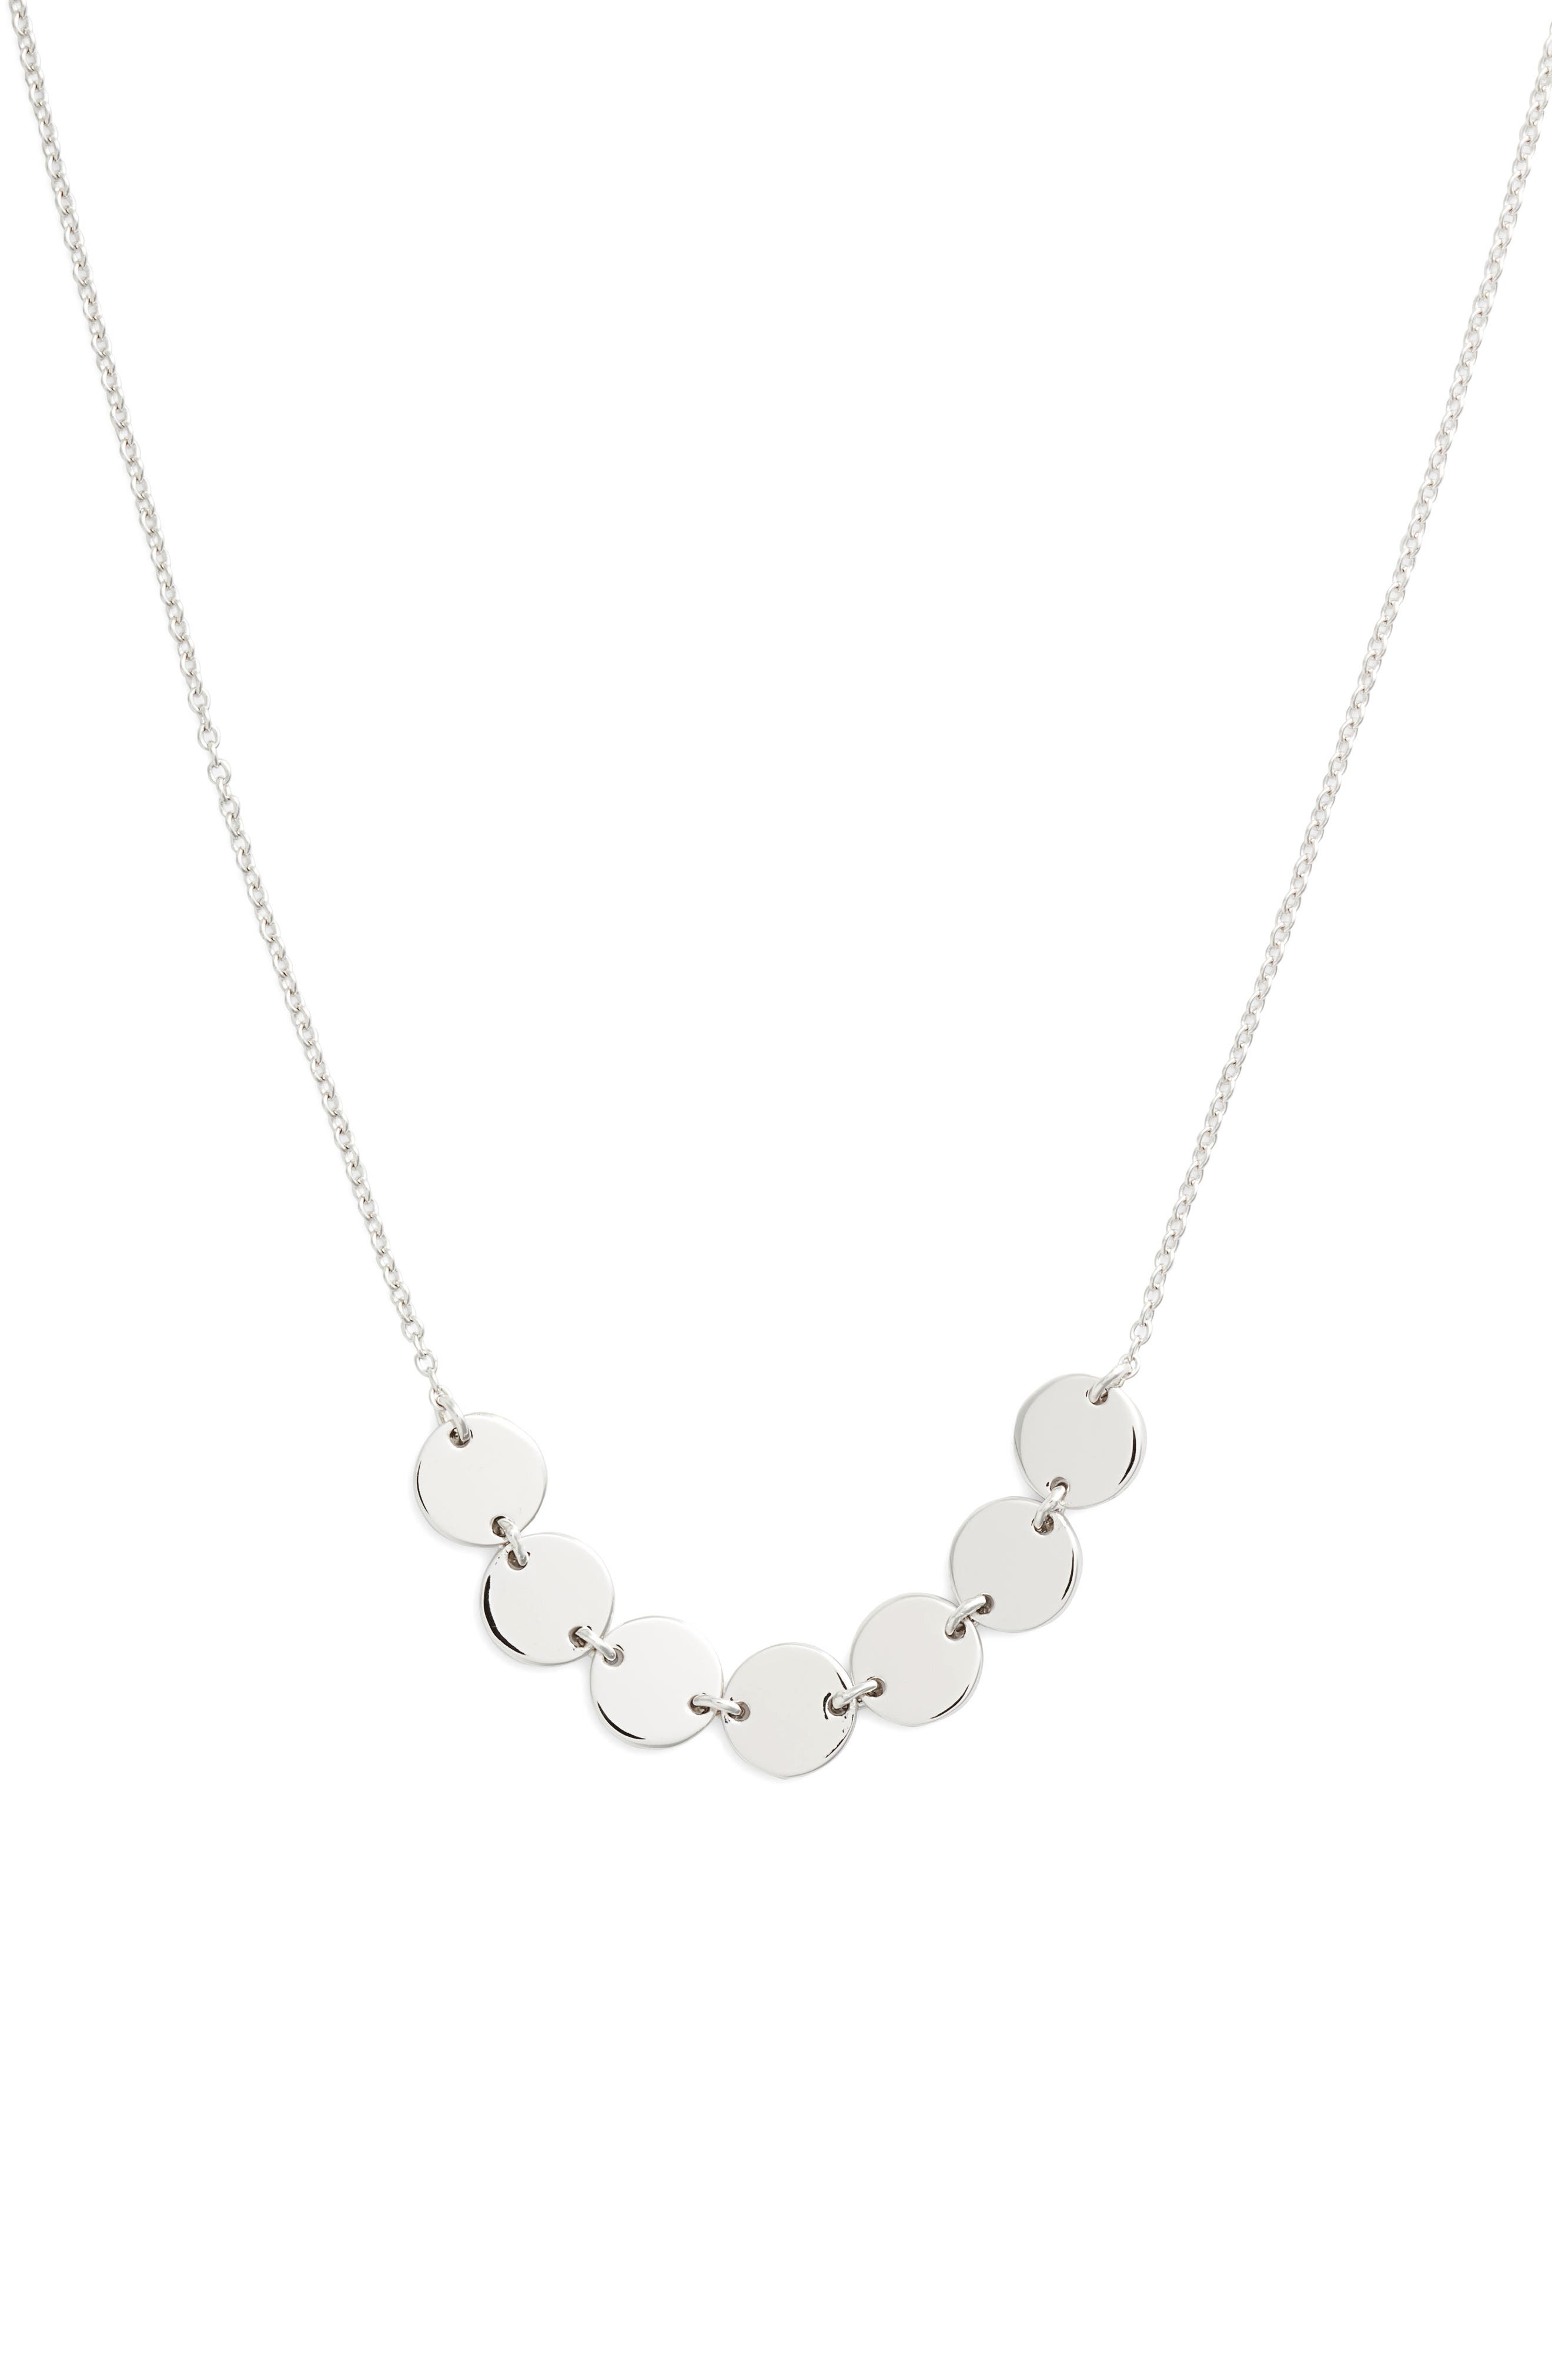 7 Symbols of Joy Choker Necklace,                         Main,                         color, 040